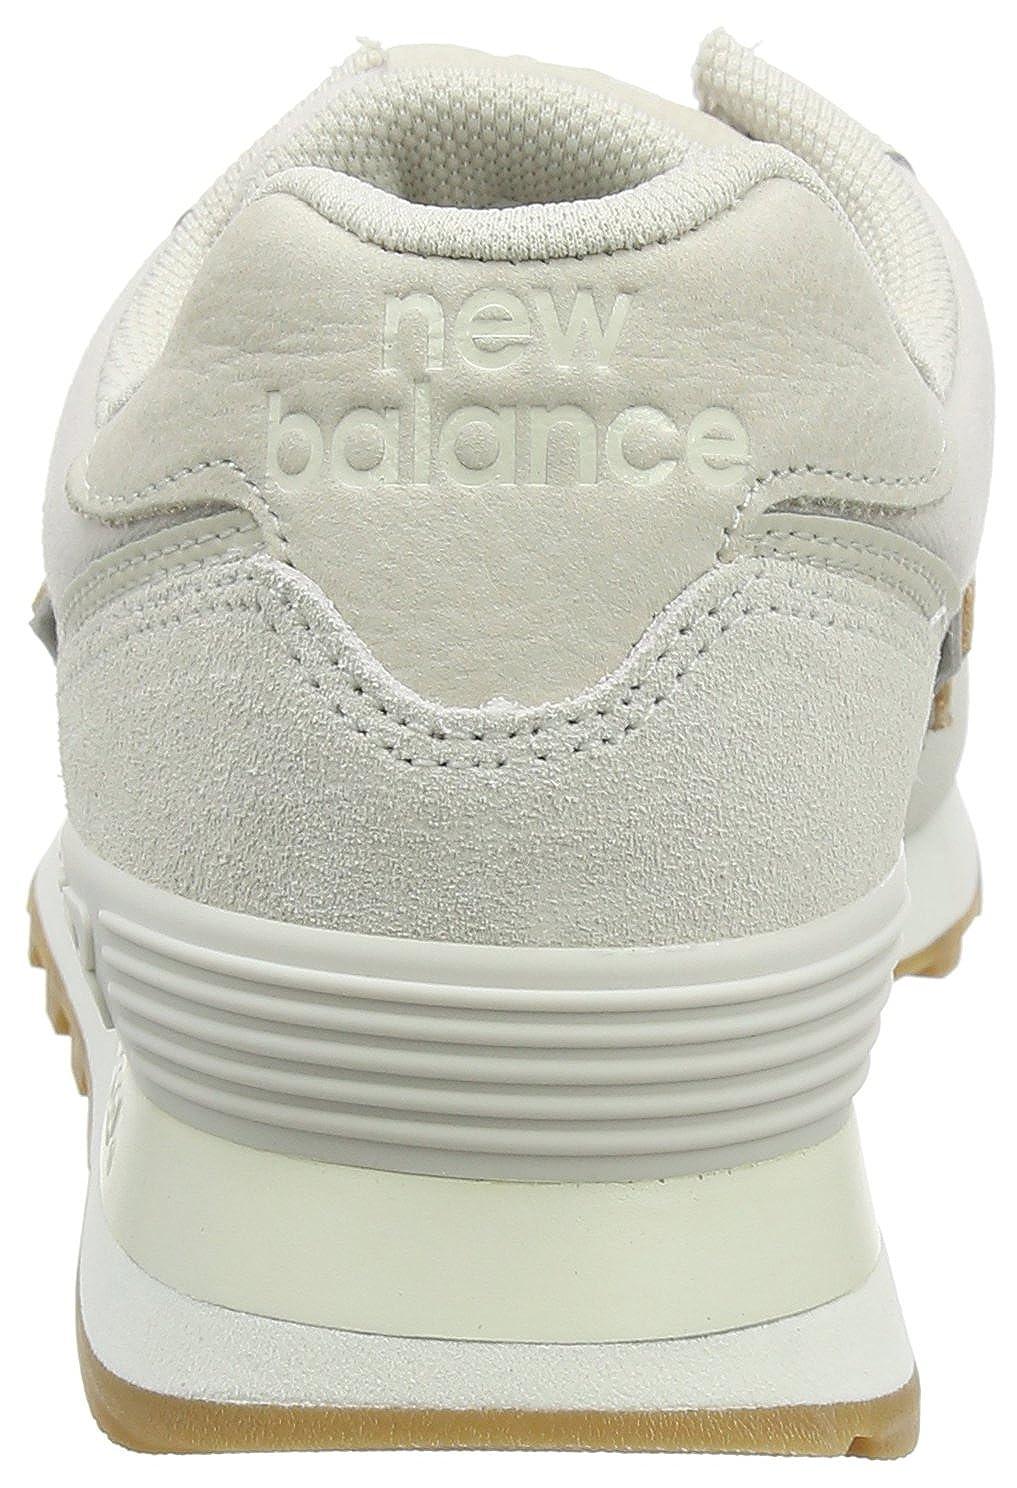 New Balance Wl574v2 Glitter Glitter Glitter Pack, scarpe da ginnastica Donna | Pratico Ed Economico  85af17